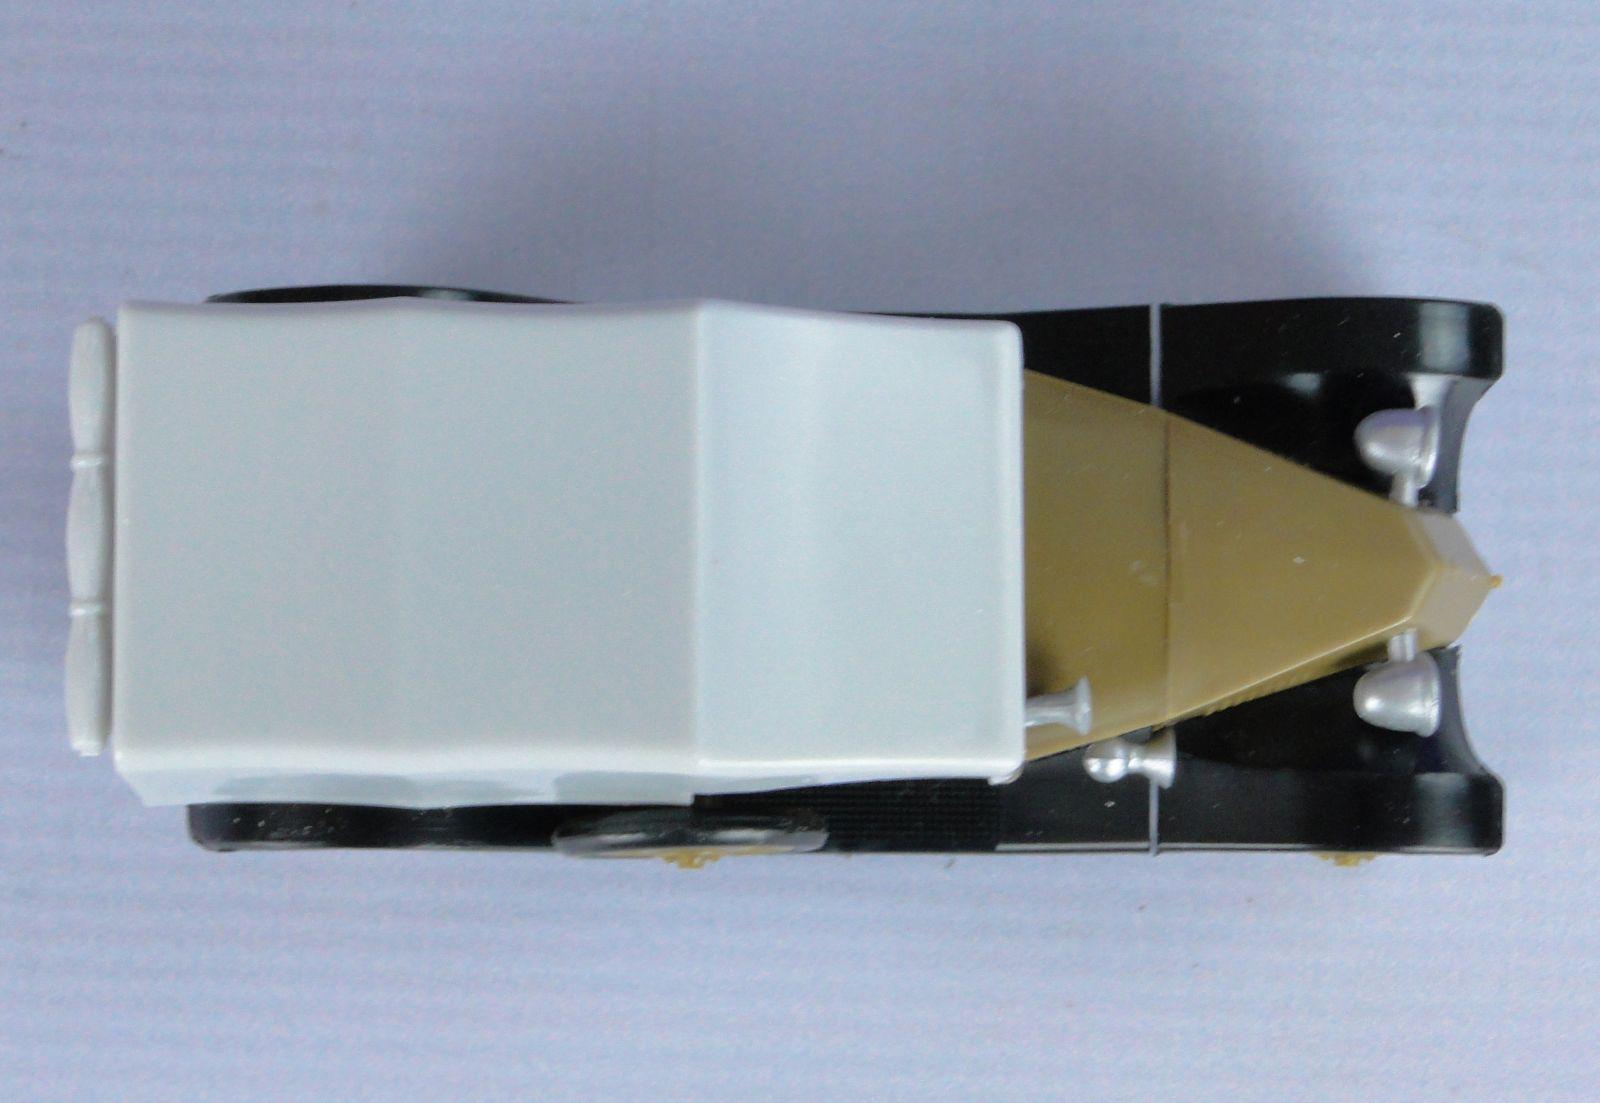 DSC06017.JPG (1600×1103)